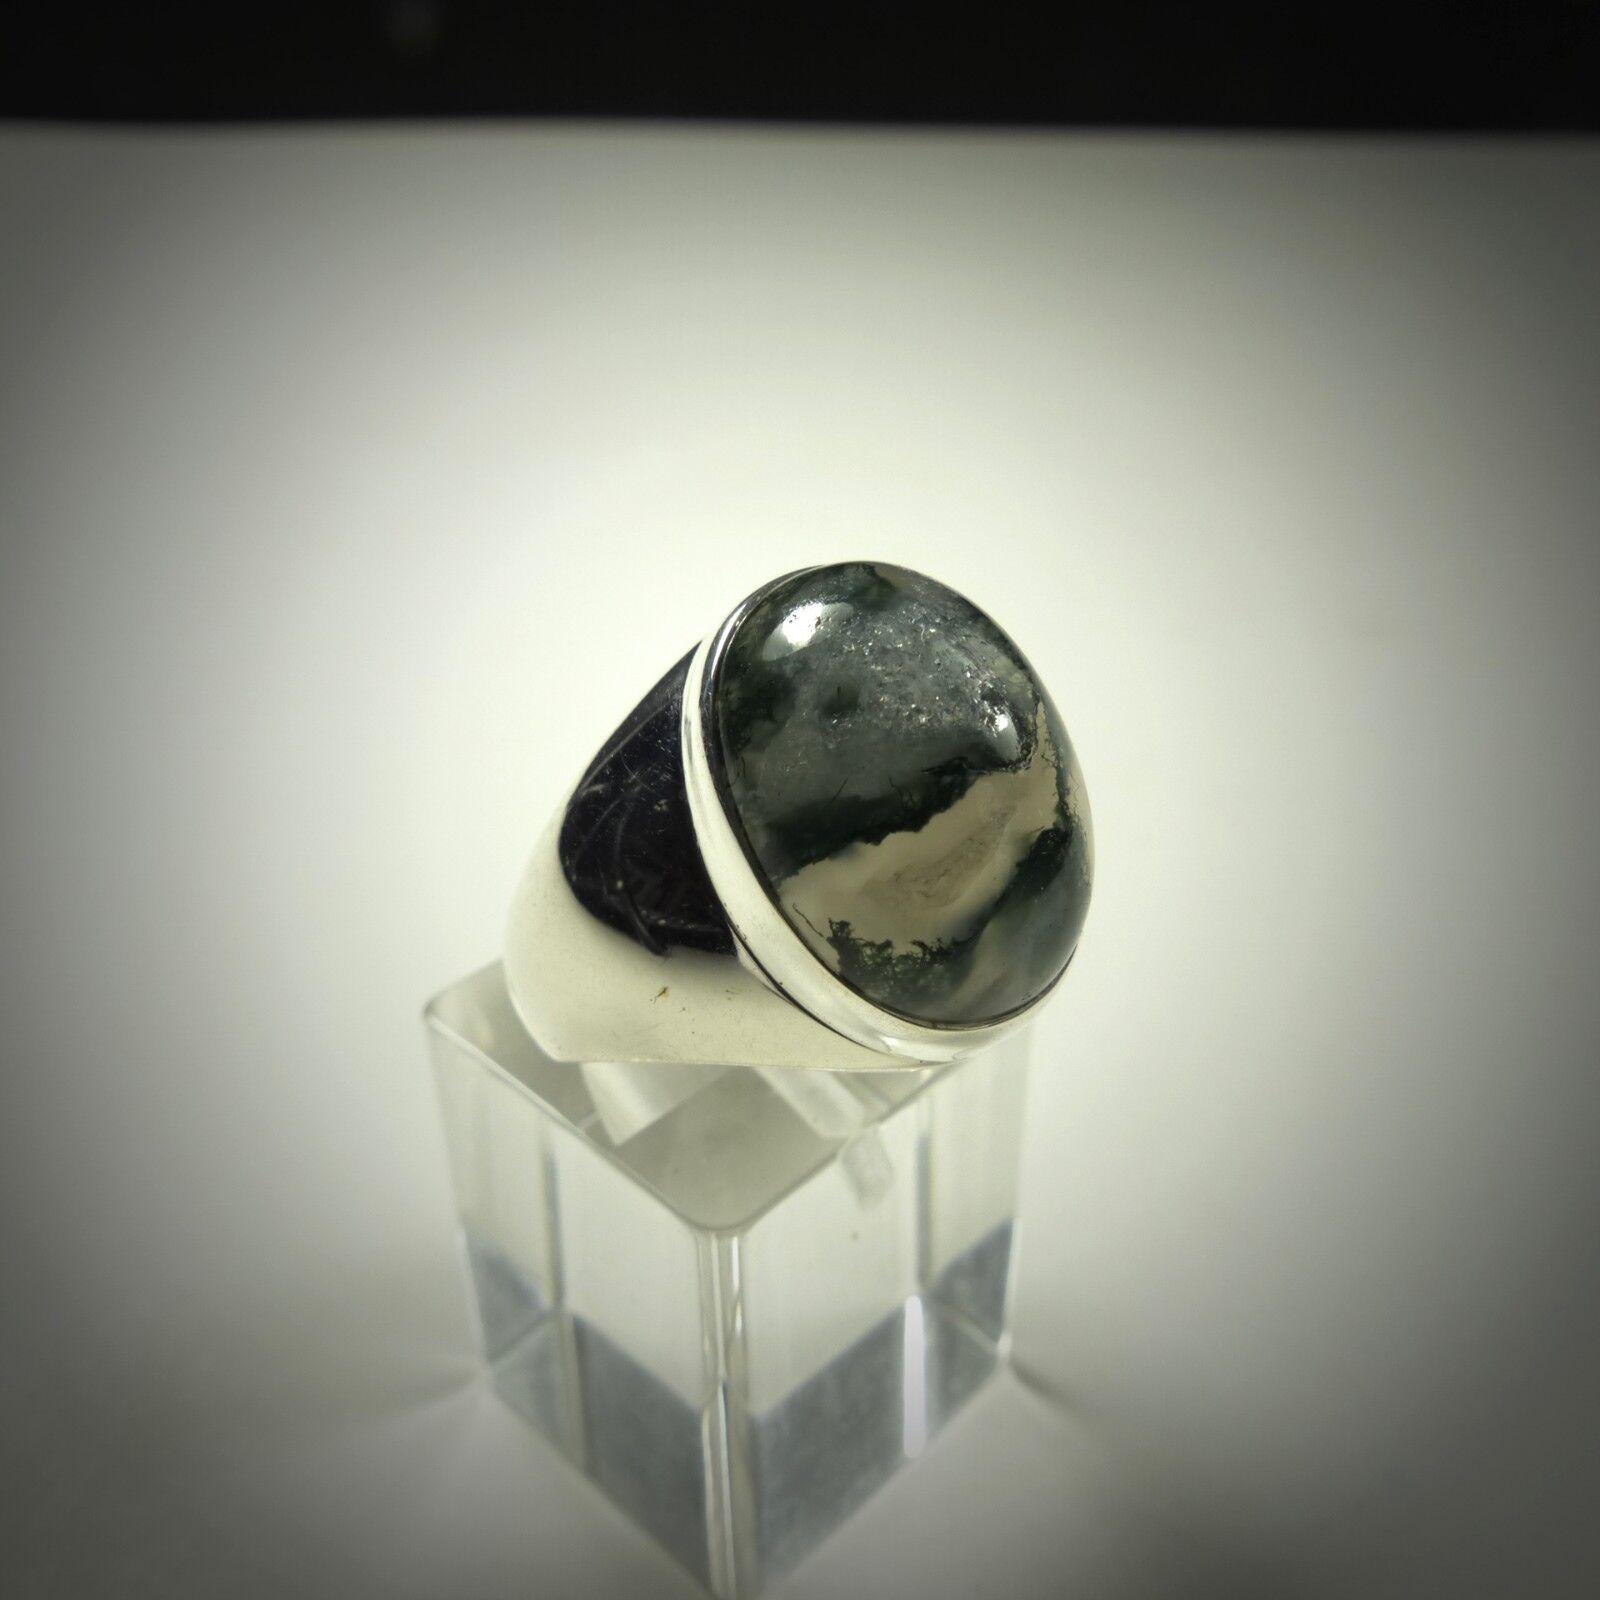 Ring Gr. 61, silver 925 mitMoosachat,Cabochon aus Indien